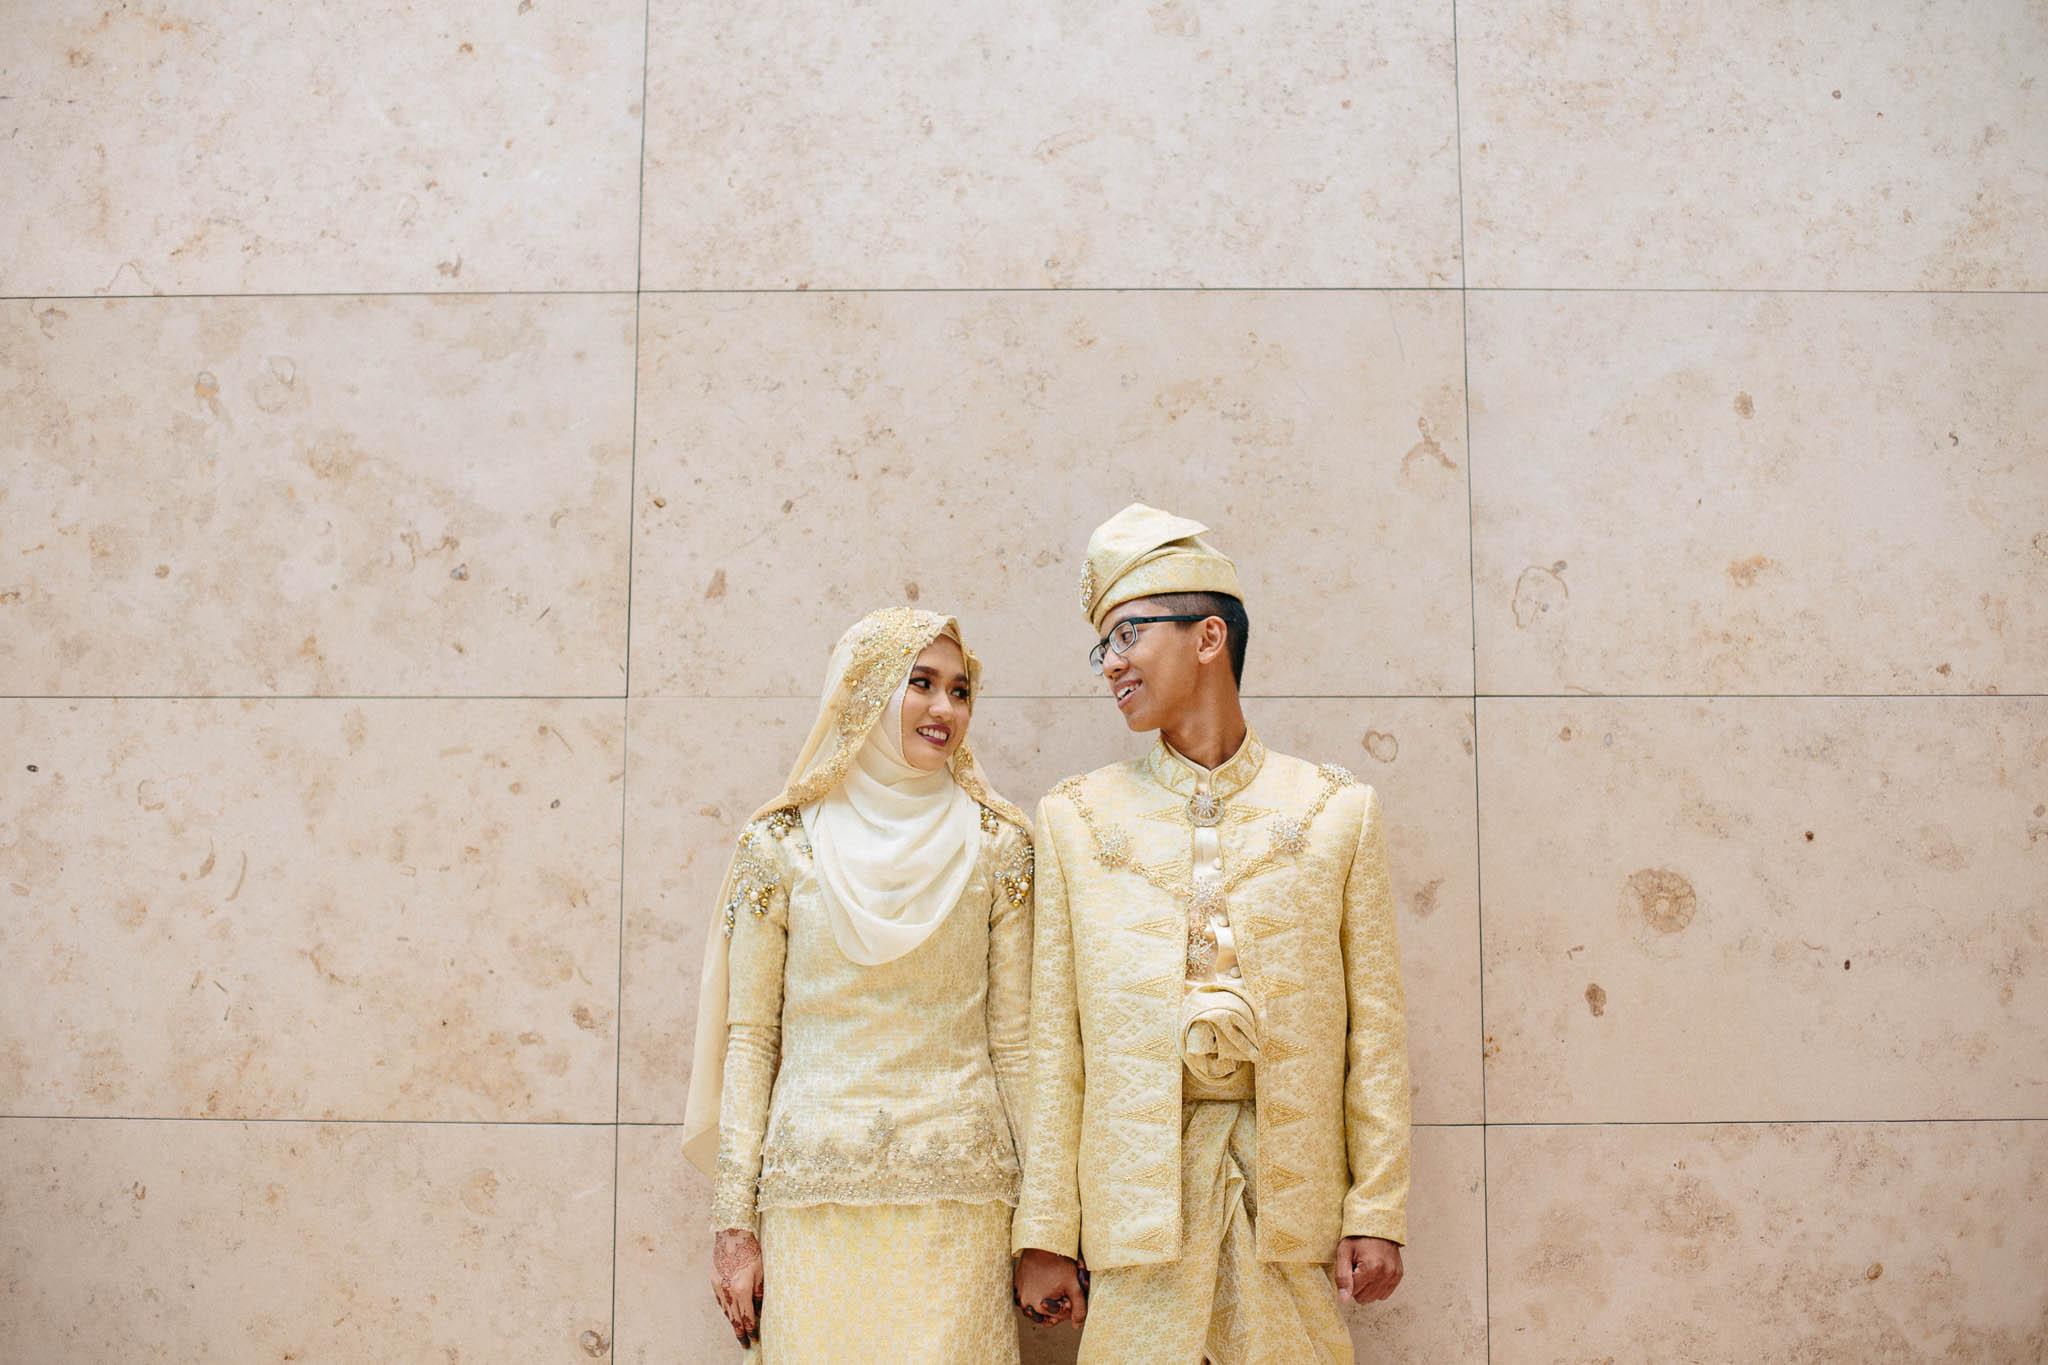 singapore-wedding-photographer-sharalyn-syazwan-041.jpg